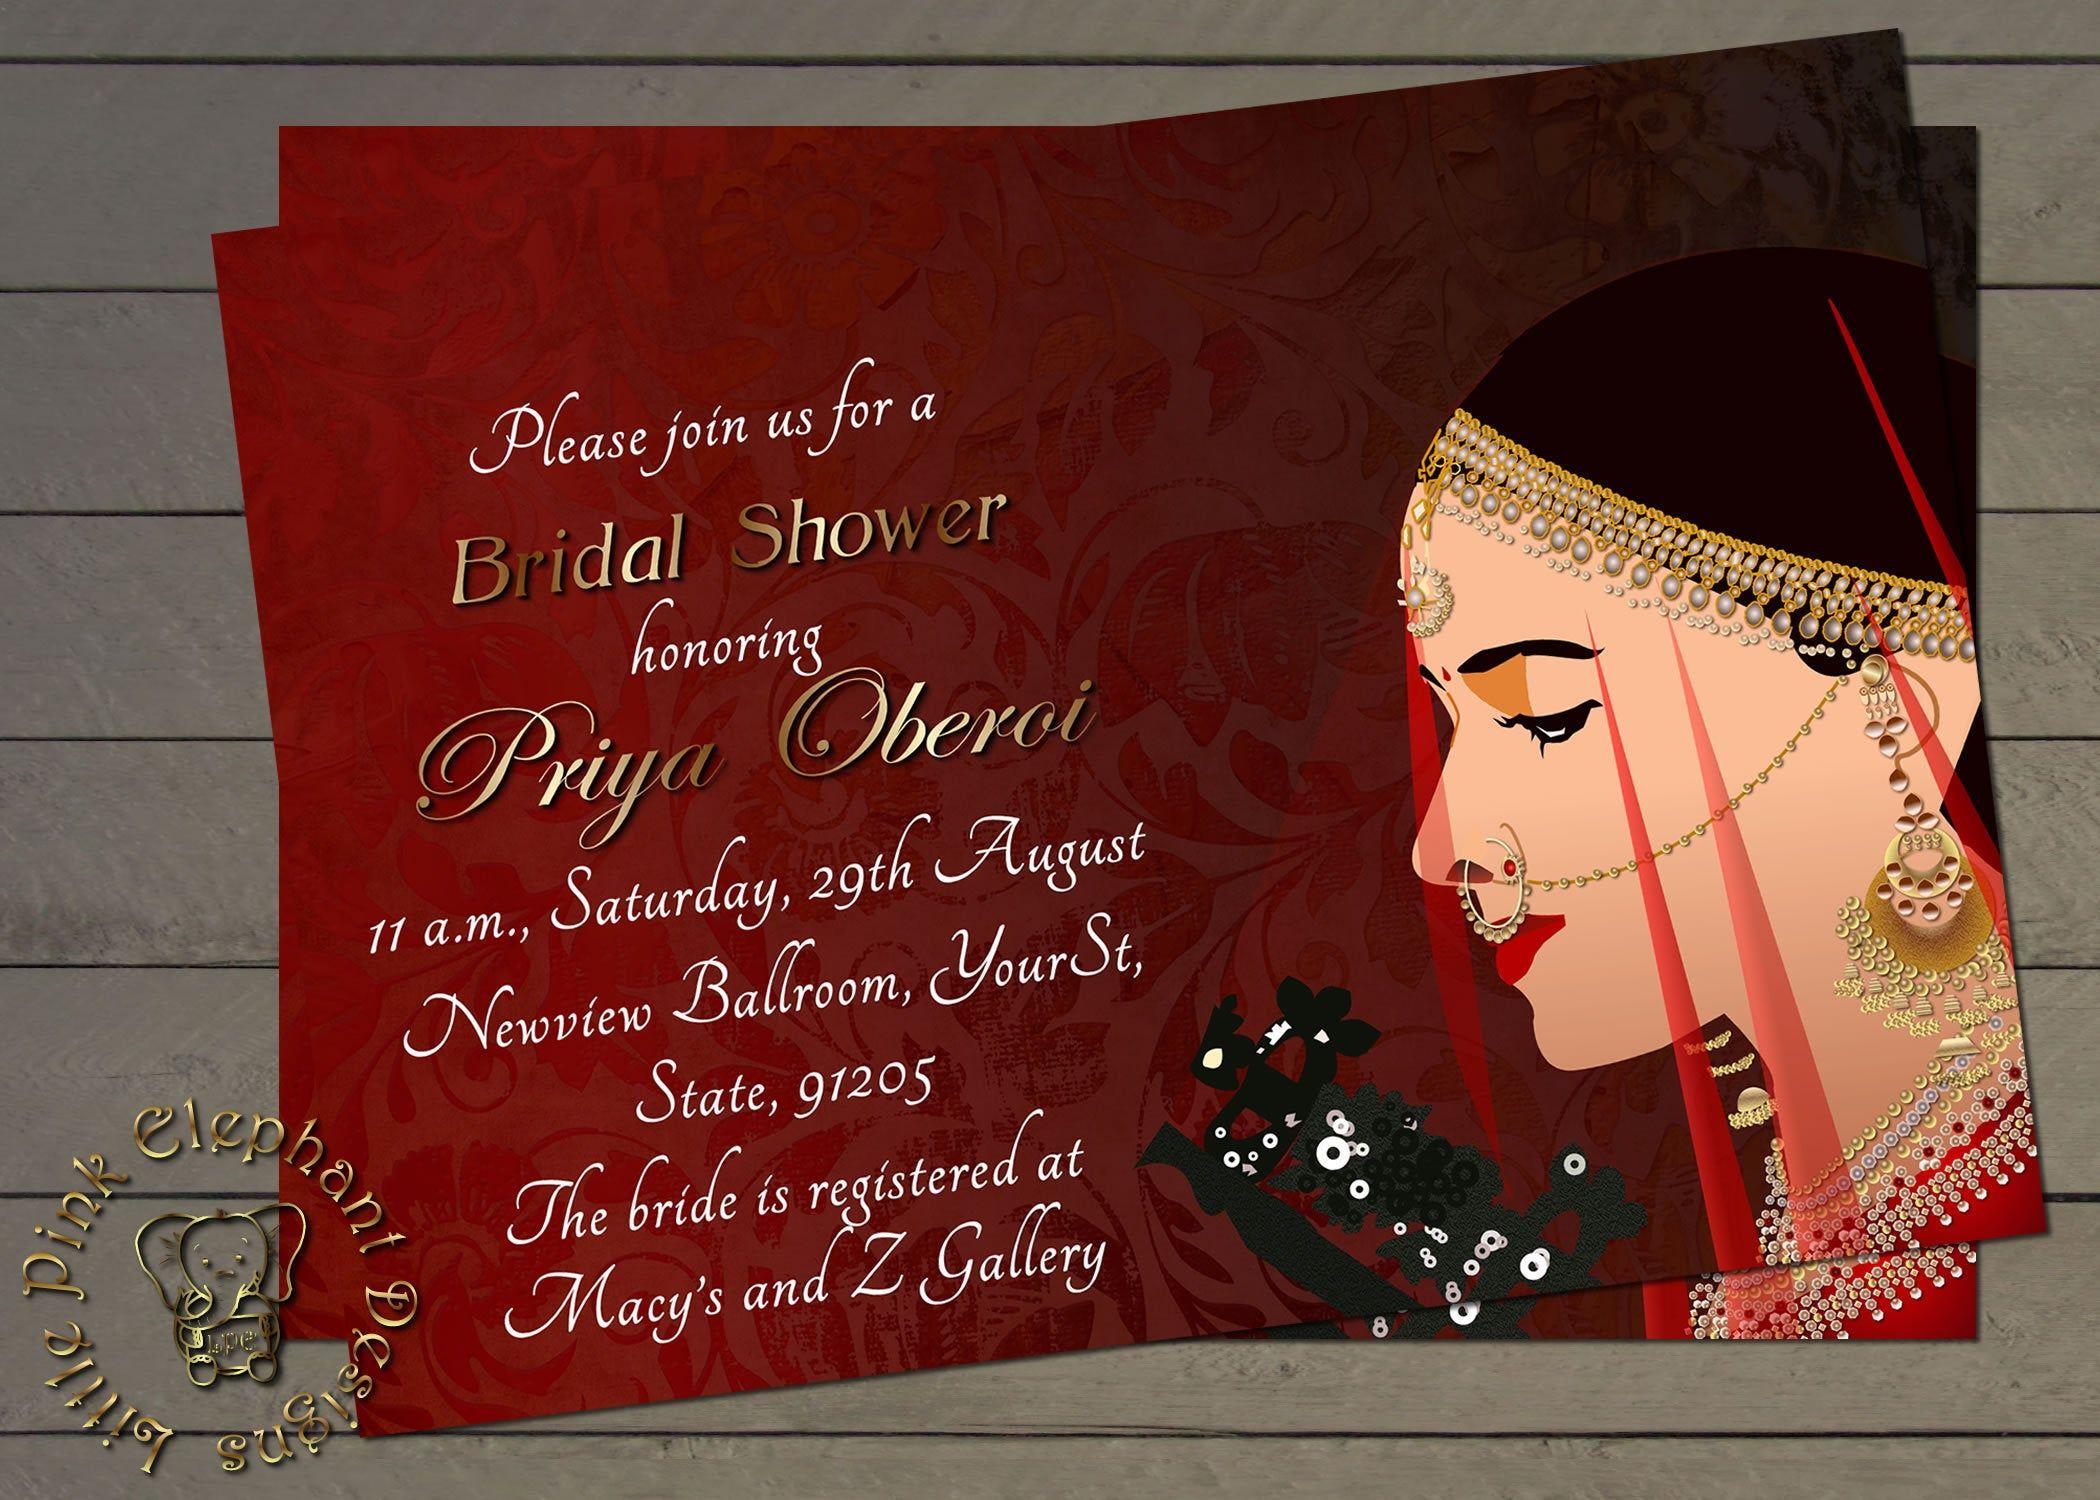 Dholki Invitation Mehndi Invitations Indian Invitations Bridal Shower Invitation Morocca Indian Invitations Indian Bridal Shower Engagement Invitations